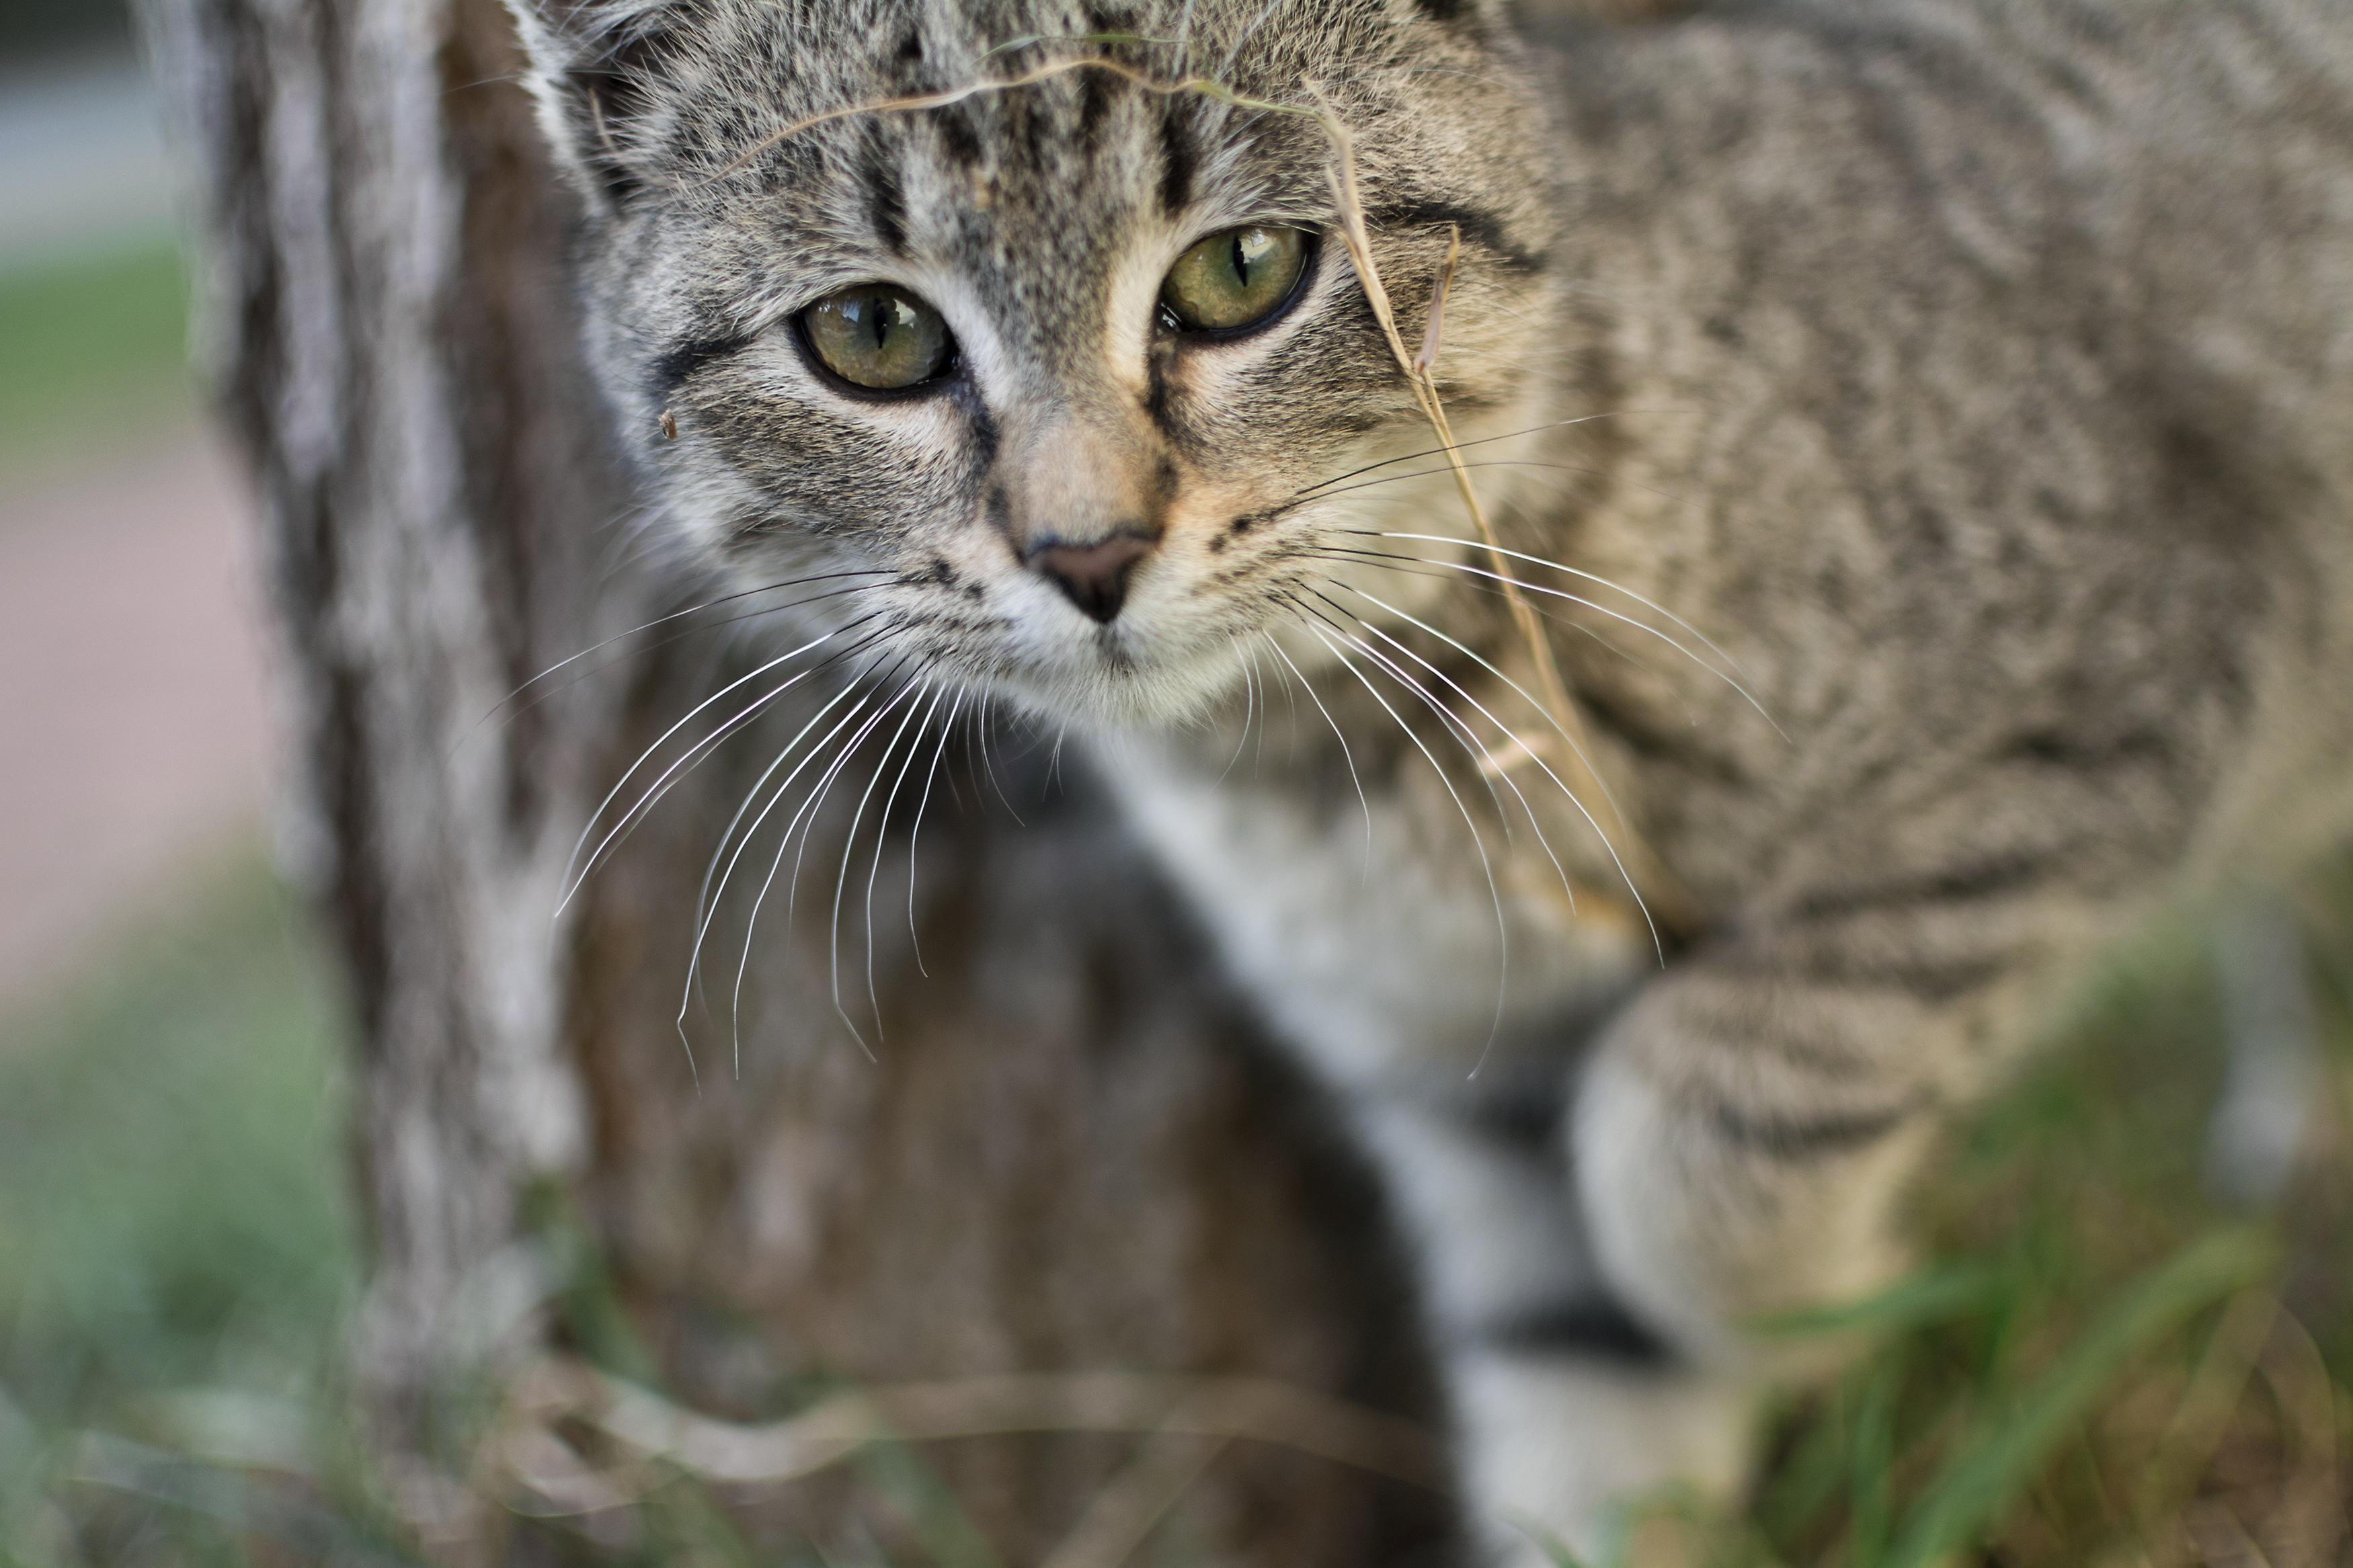 Free Image: Curious Gray Cat | Libreshot Public Domain Photos